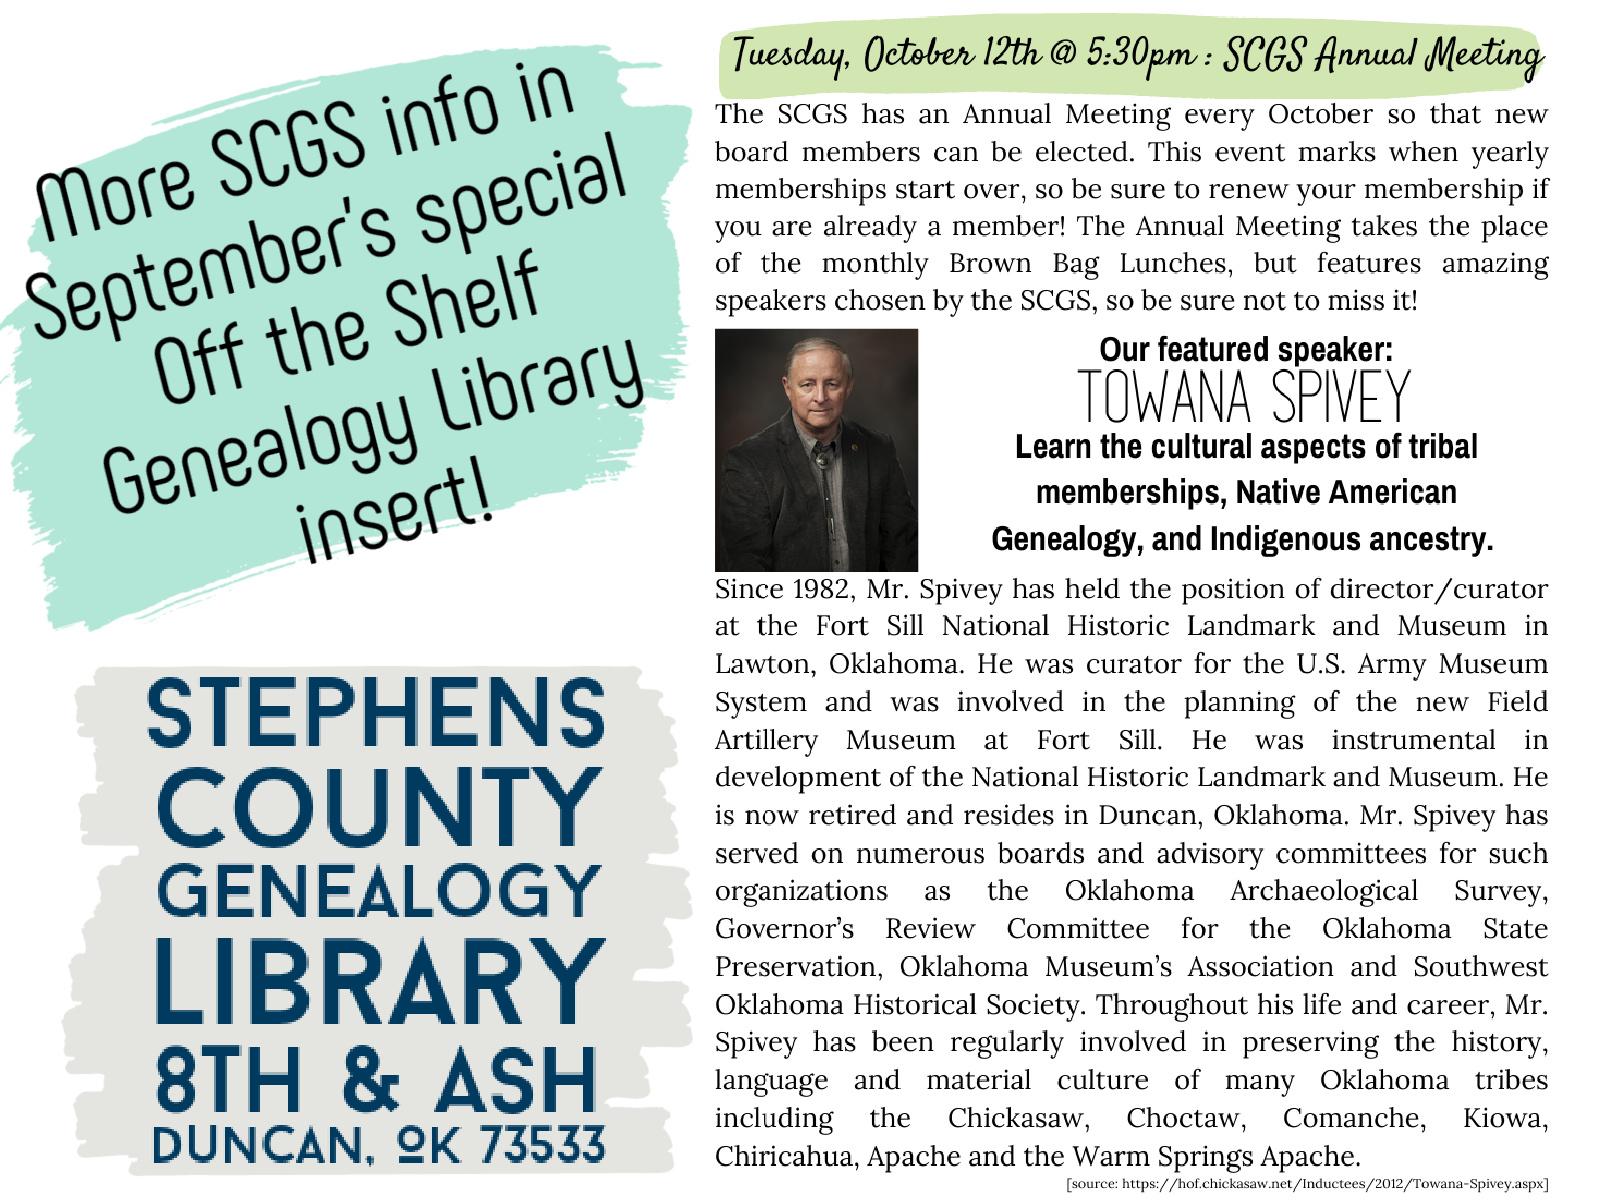 SCGS Annual Meeting: Towana Spivey @ Genealogy Library